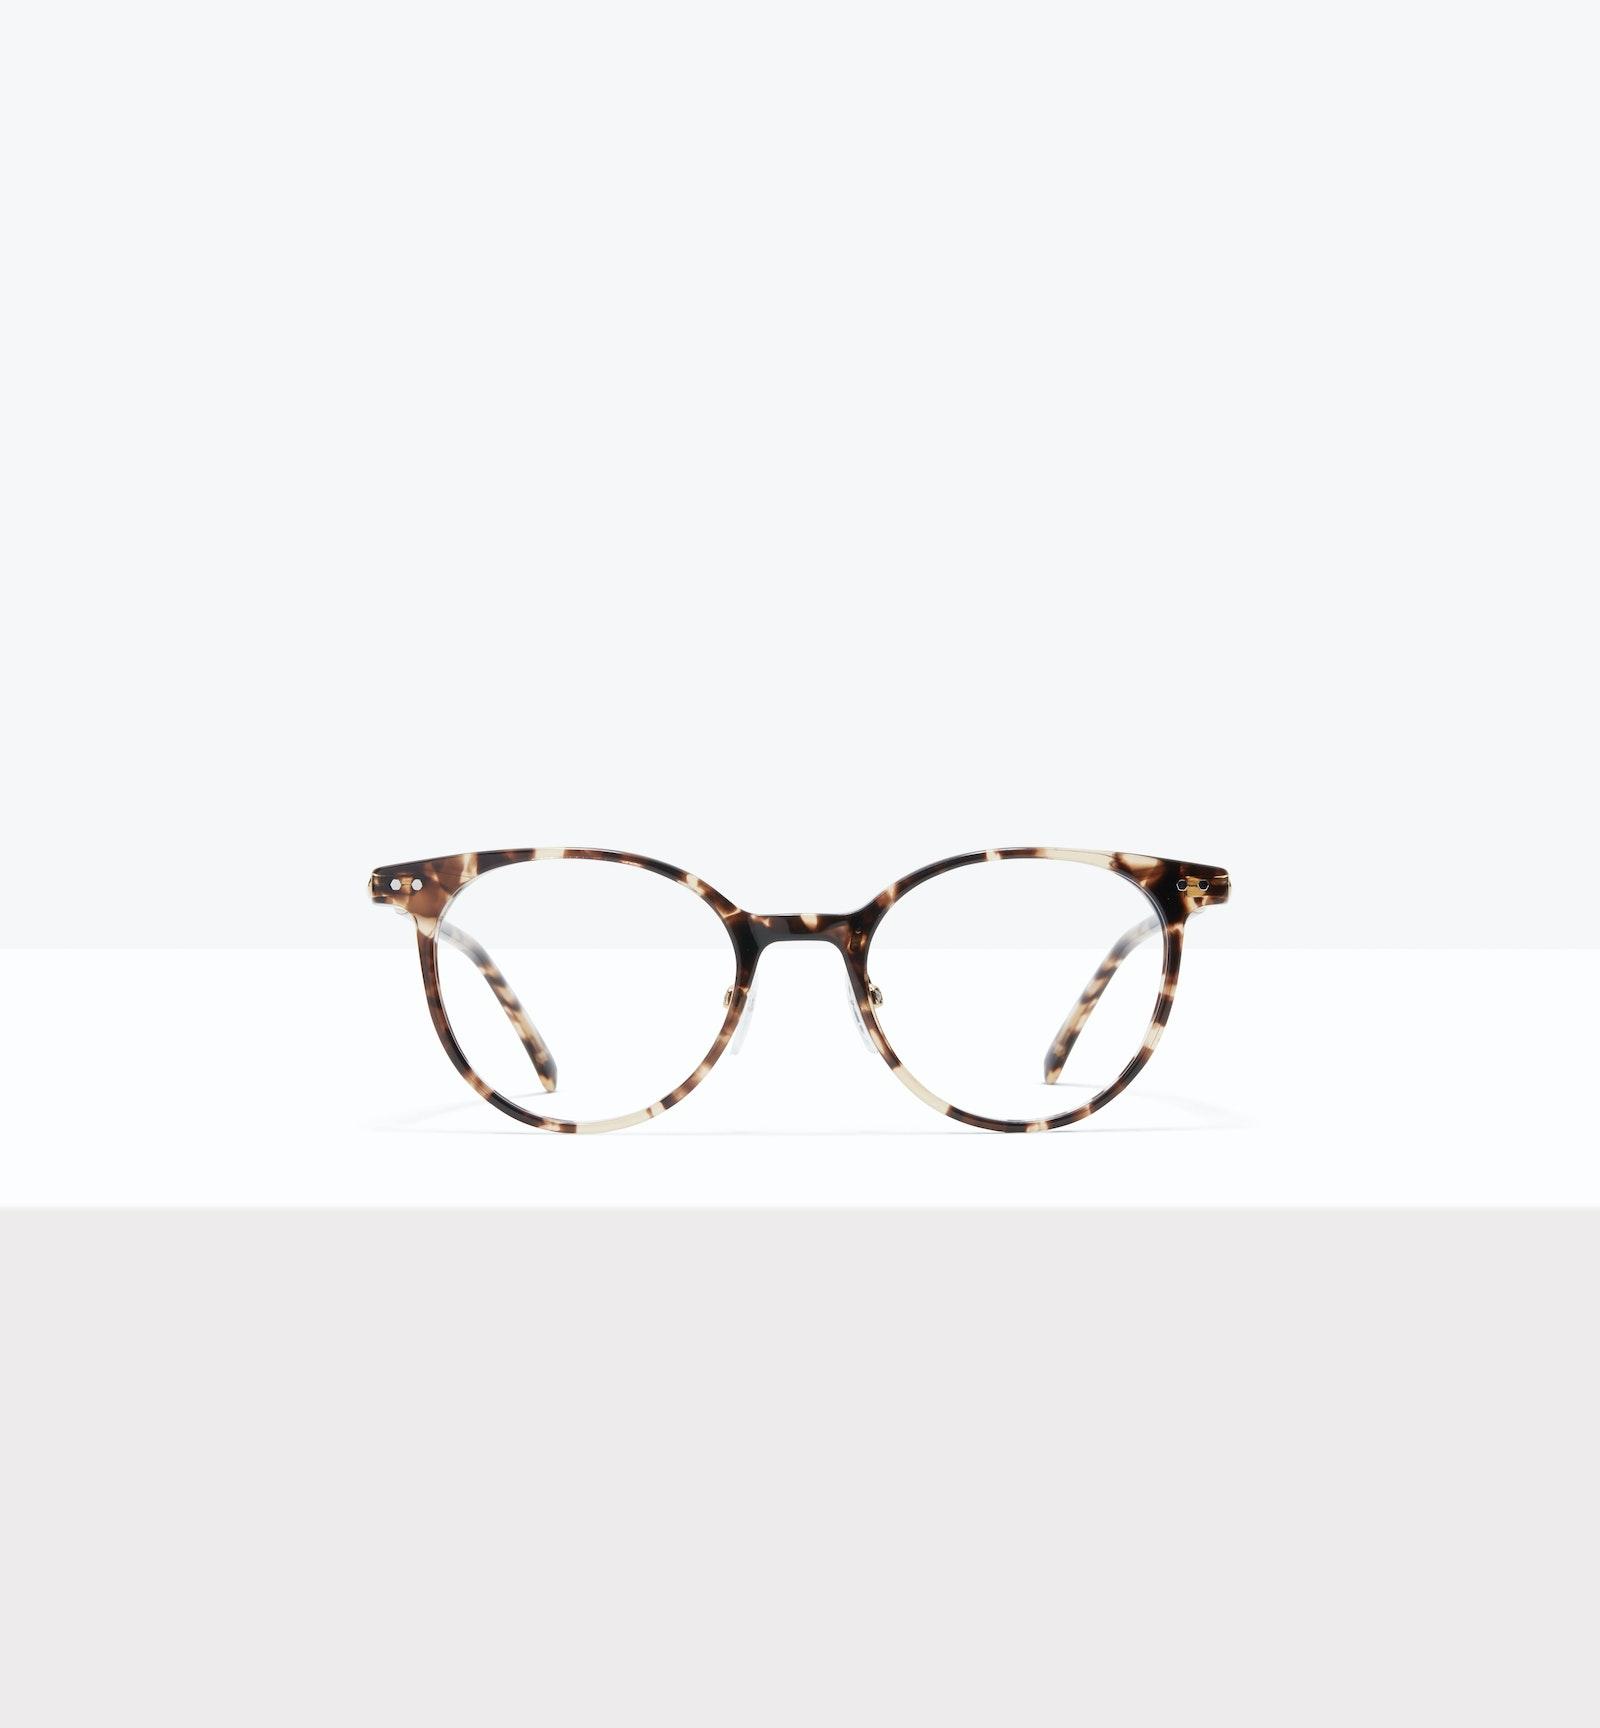 Affordable Fashion Glasses Round Eyeglasses Women Lightheart L Leopard